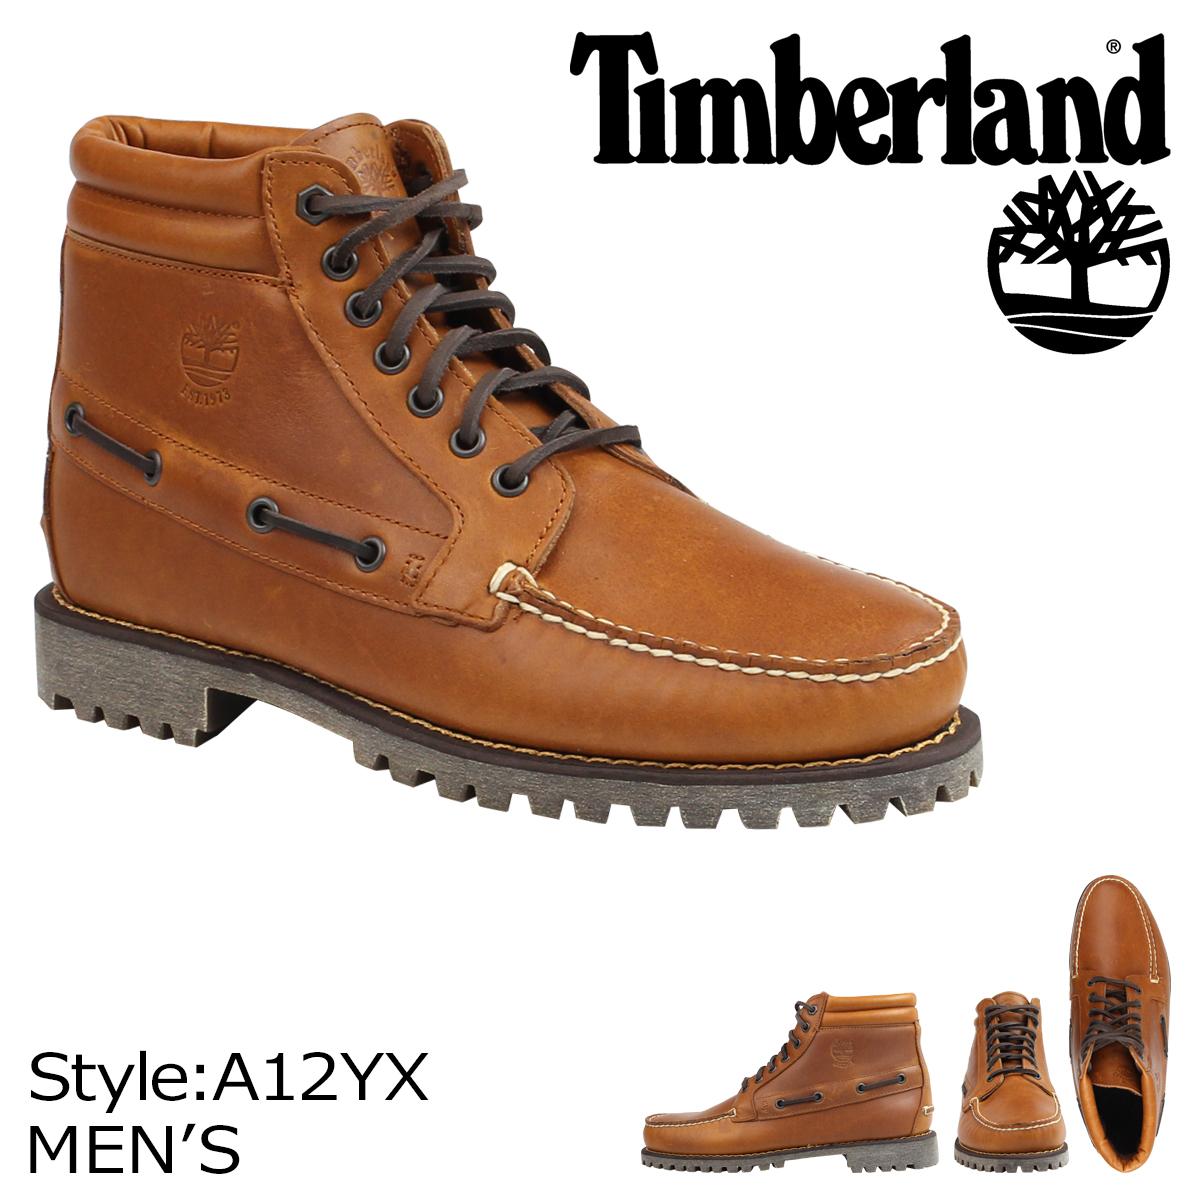 7 Timberland Timberland PENDLETON AUTHENTICS 7 EYE CHUKKA chukka boots authentic アイチャッカ A12YX W Wise clay pot men